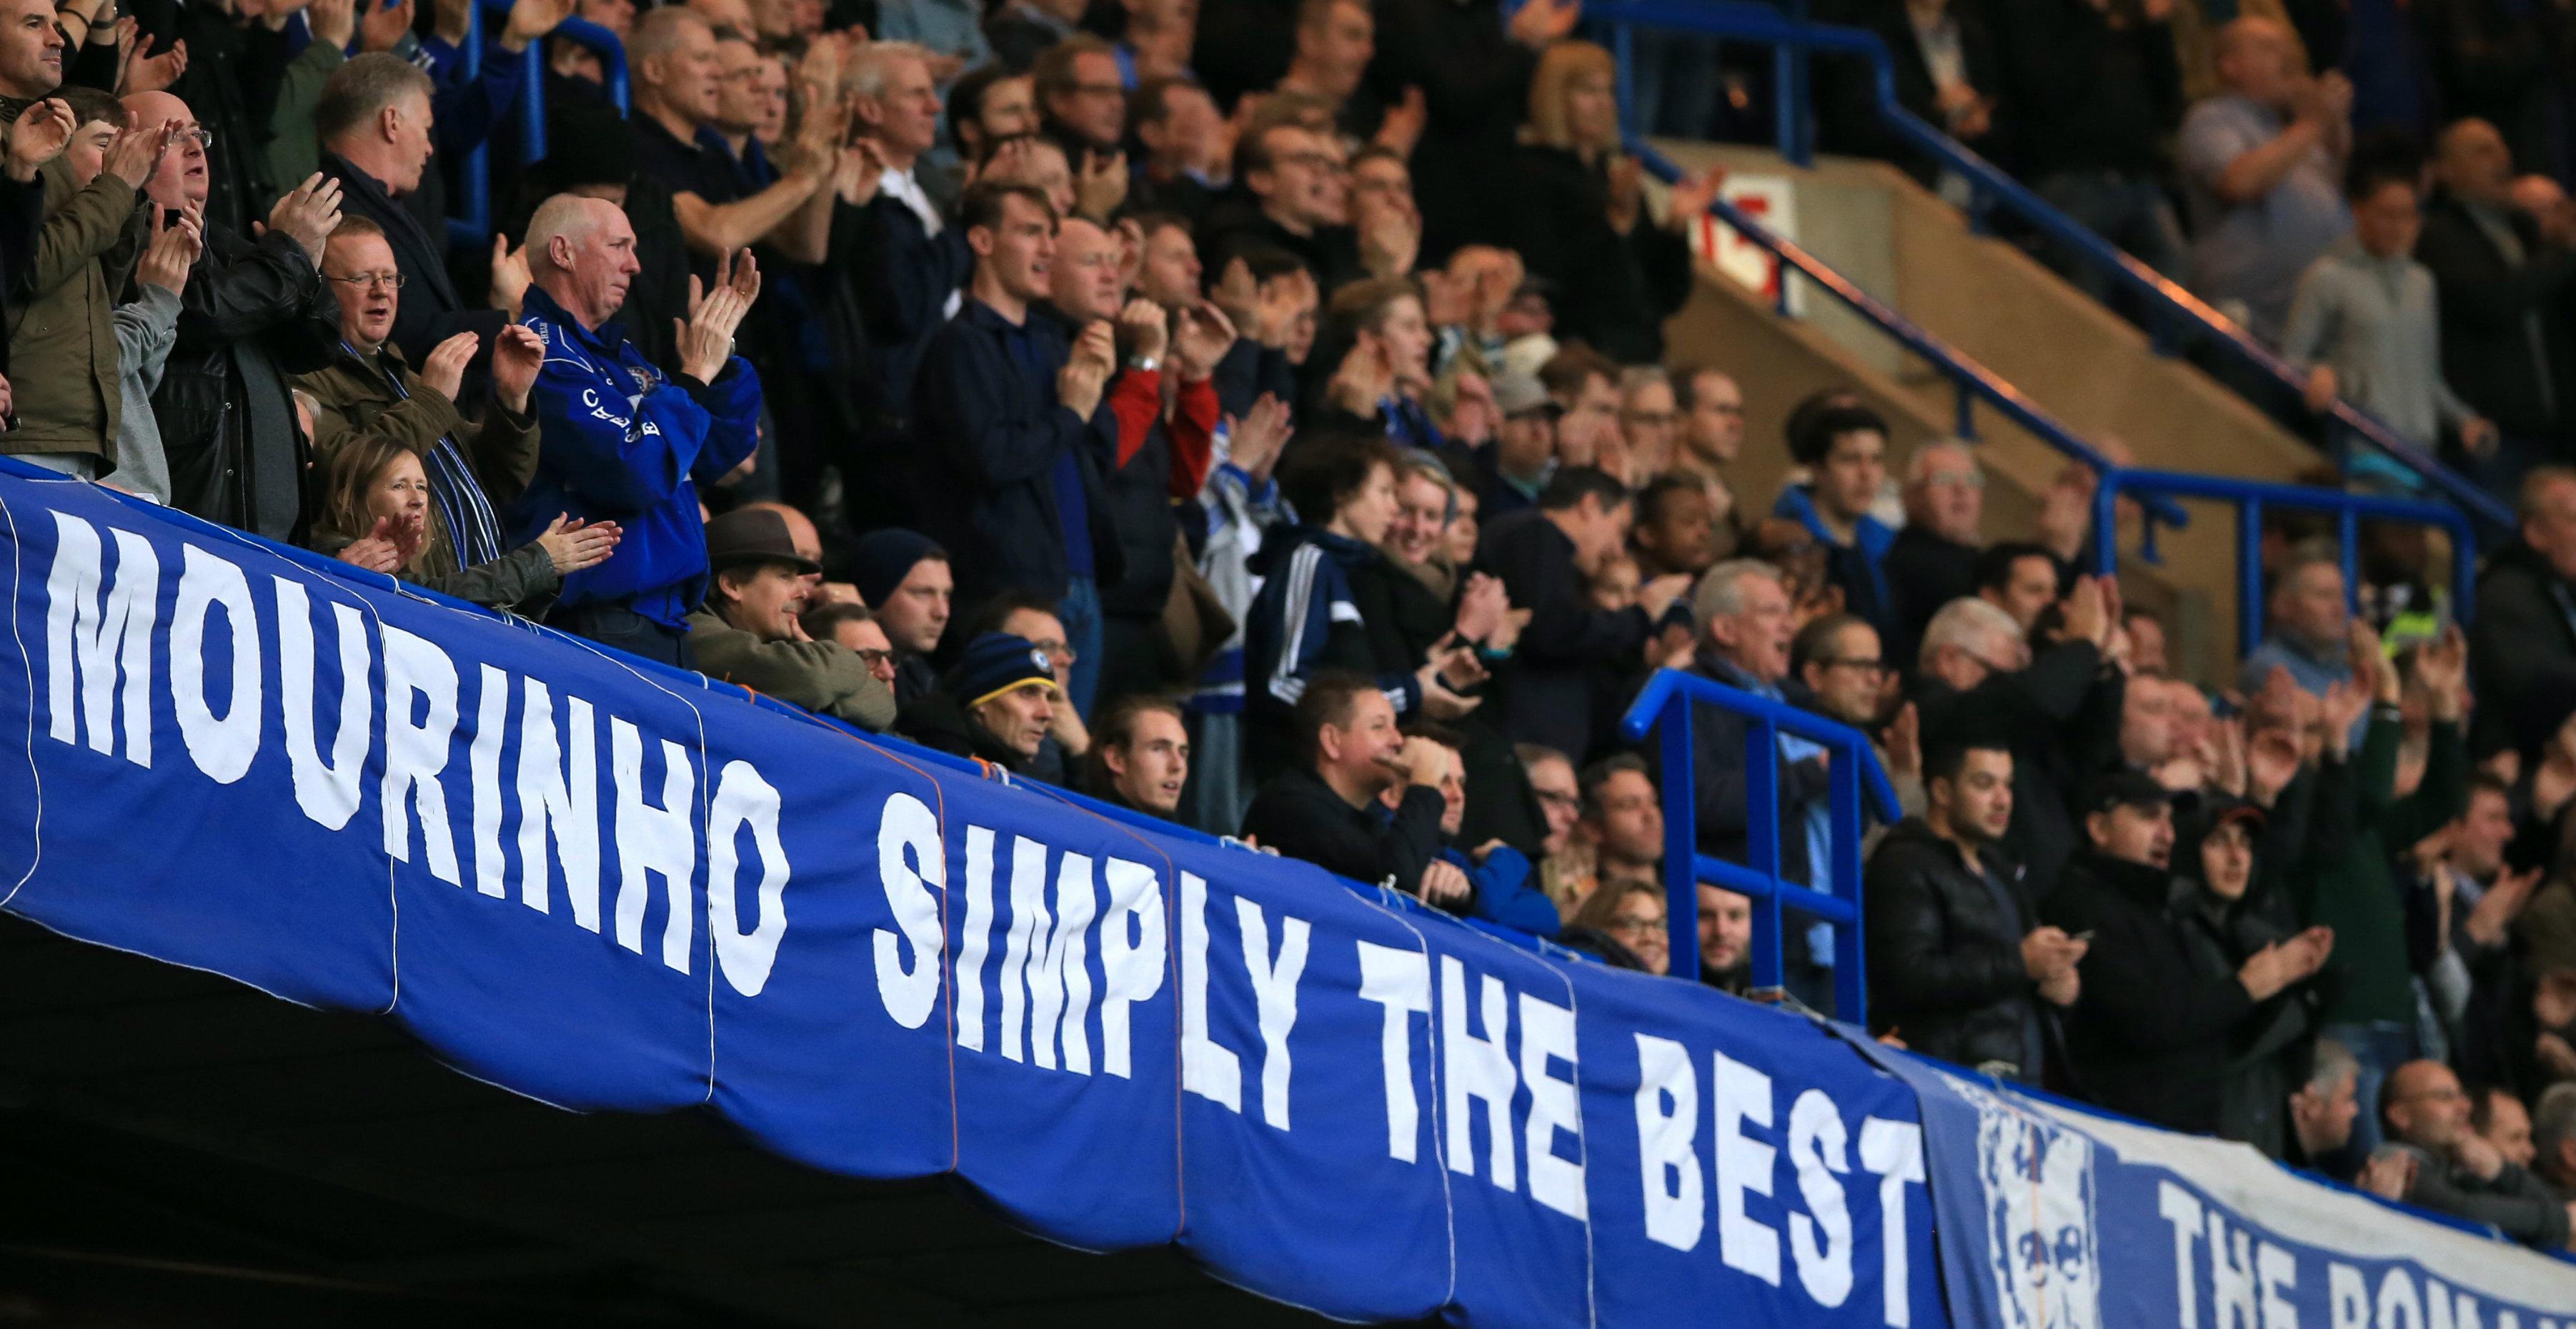 Mourinho's sacking last season upset many Chelsea supporters